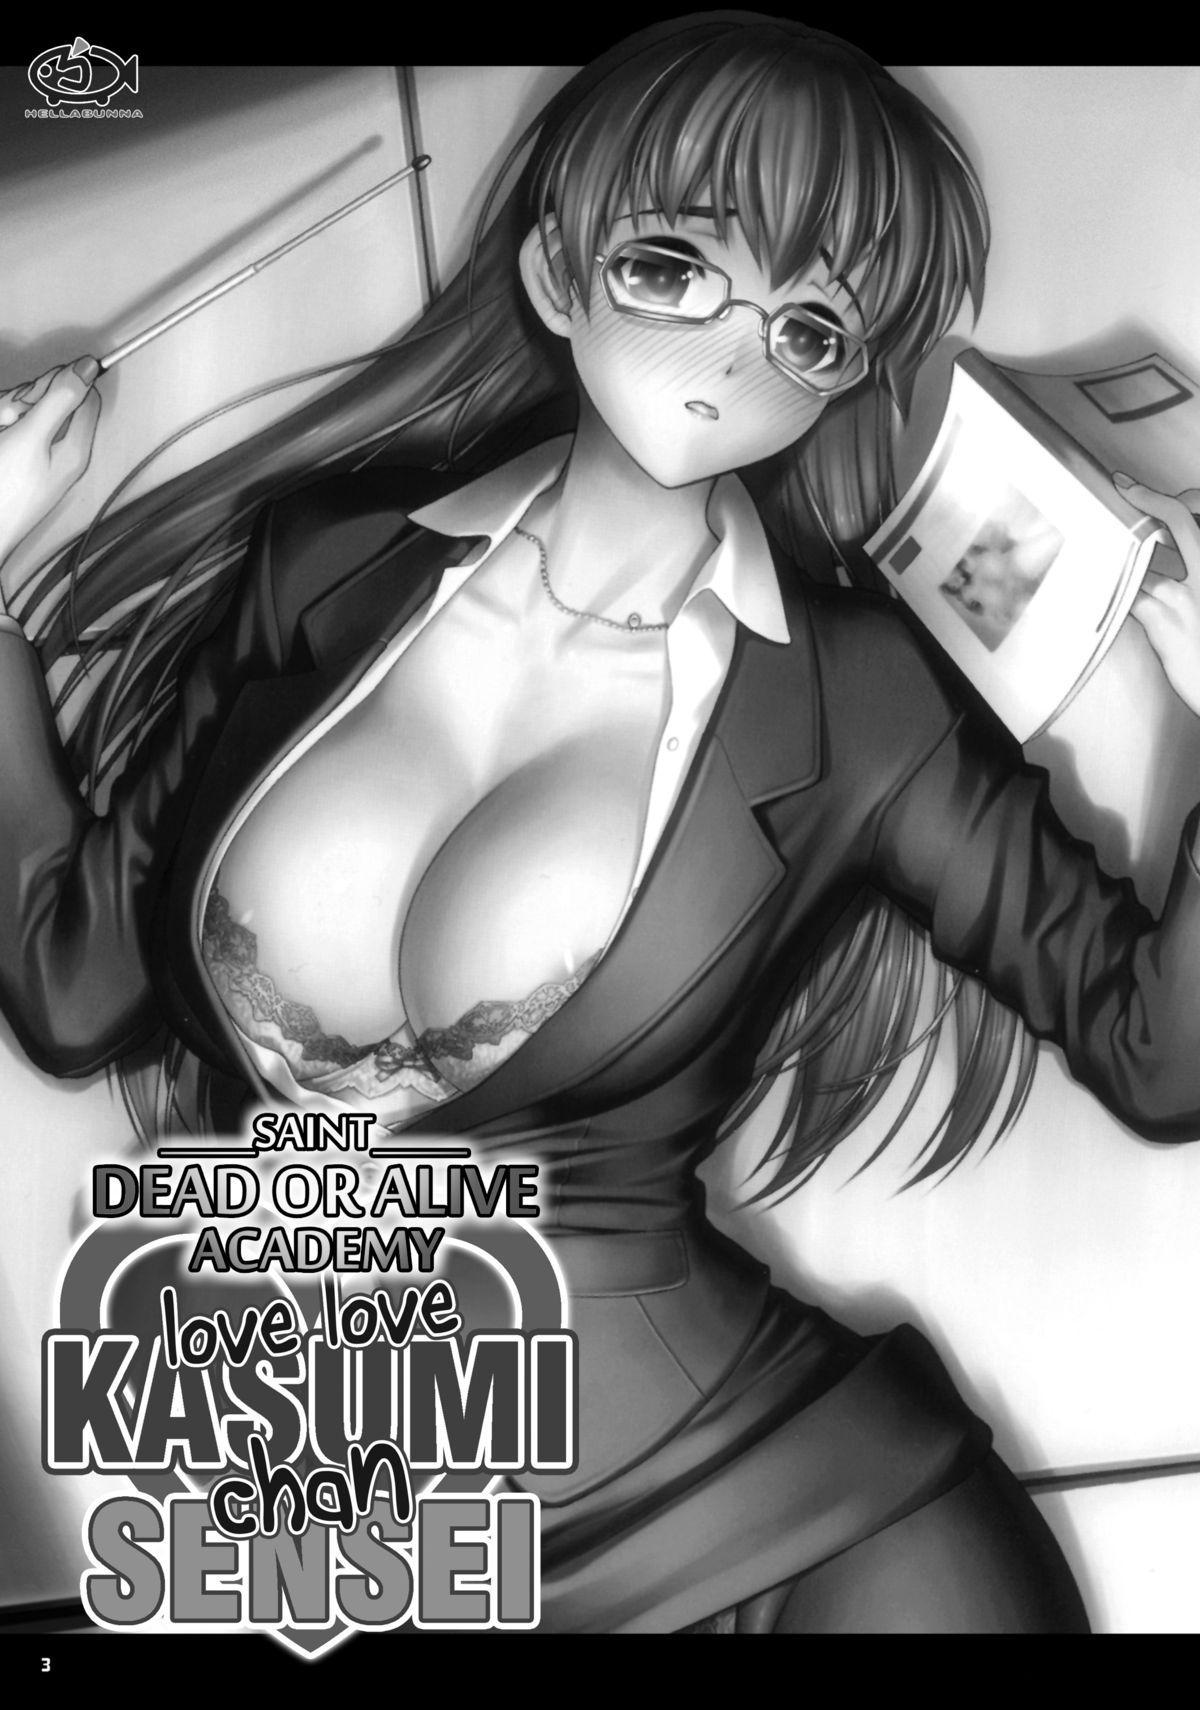 St. Dead or Alive Highschool - Love Love Kasumi Chan Teacher 1